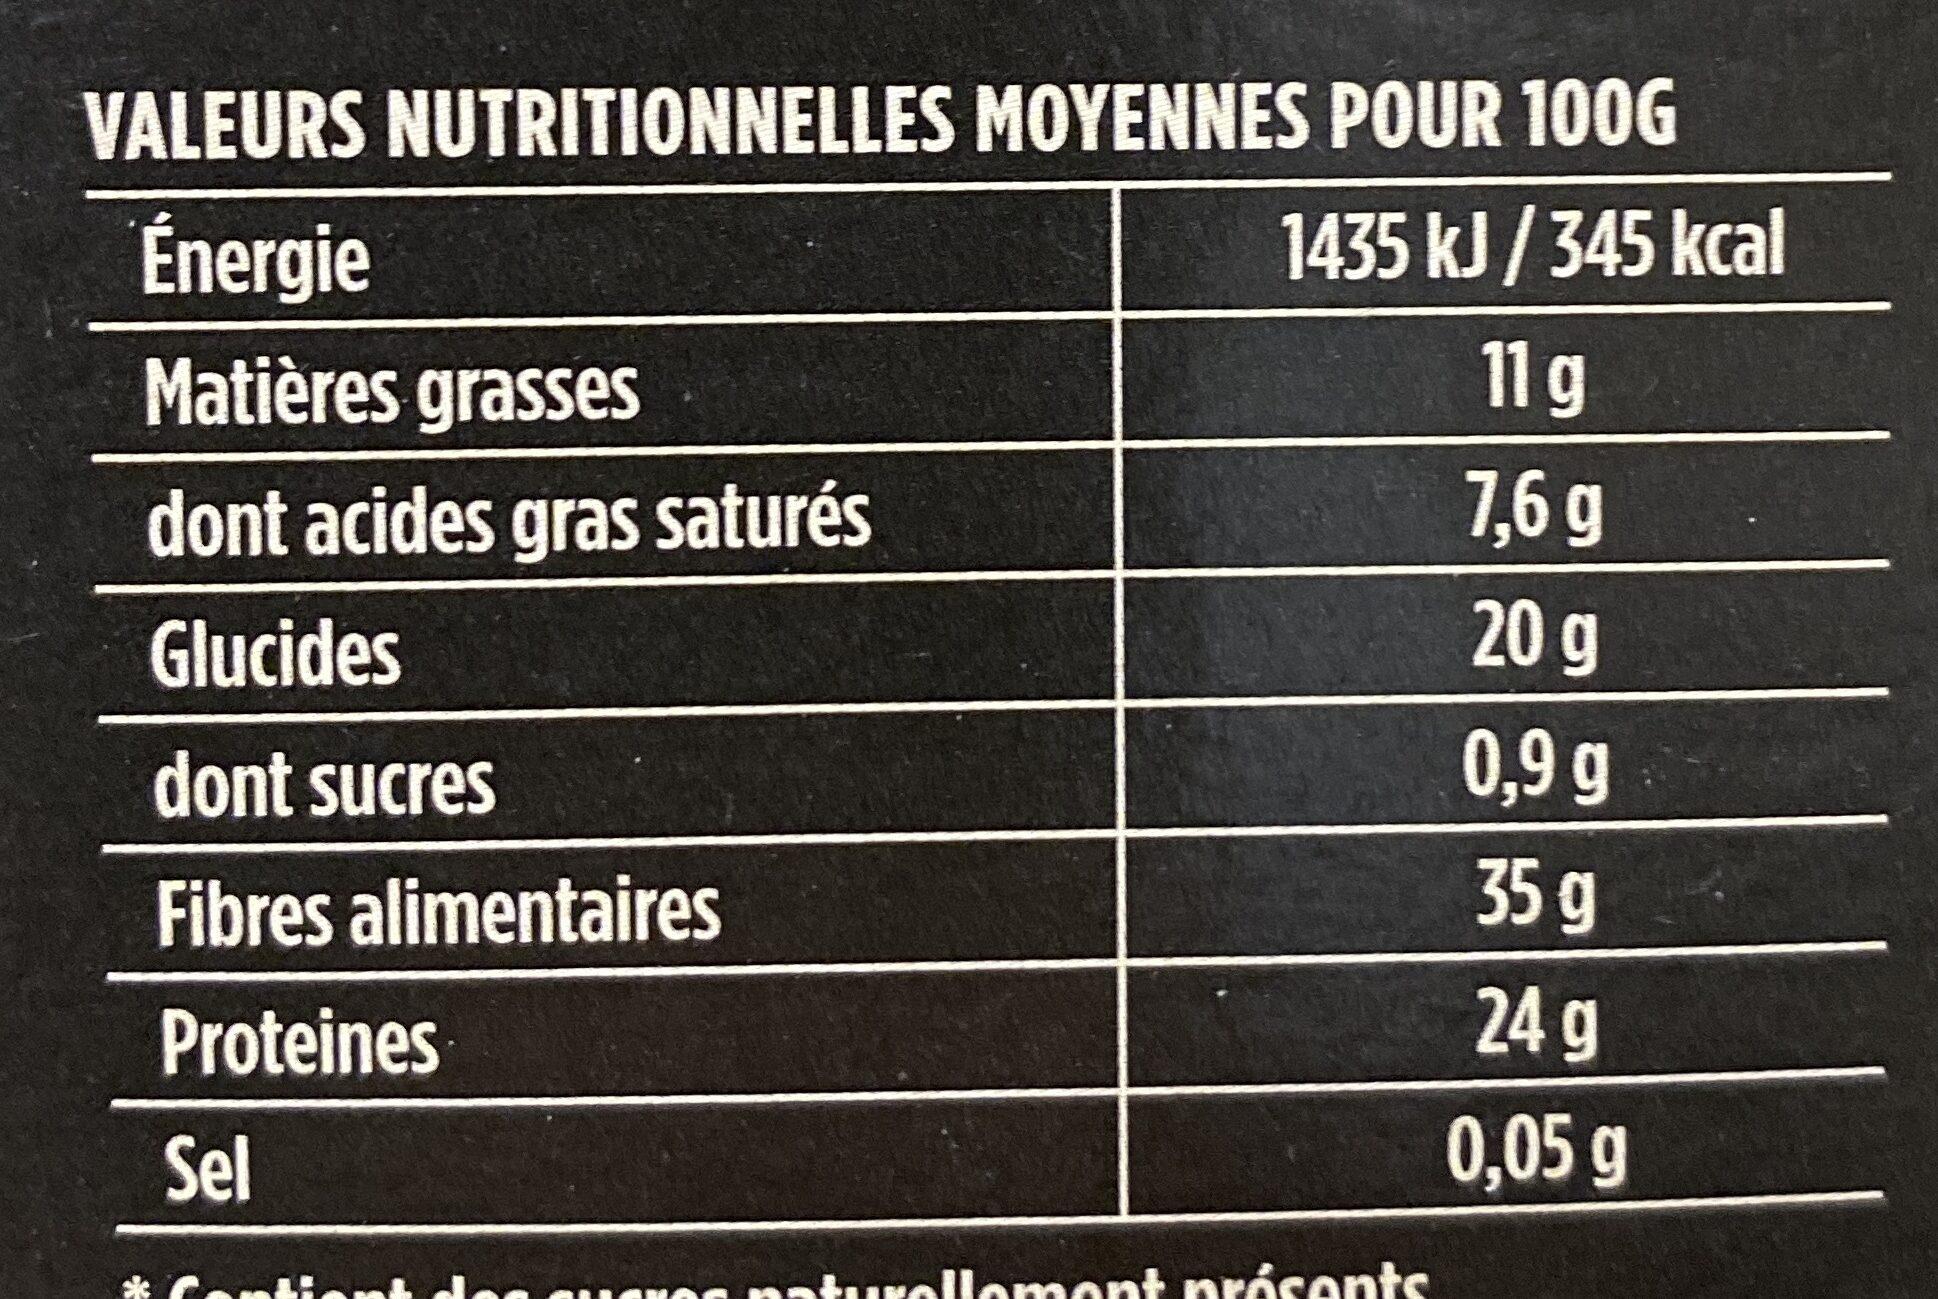 Poudre de cacao maigre - حقائق غذائية - fr